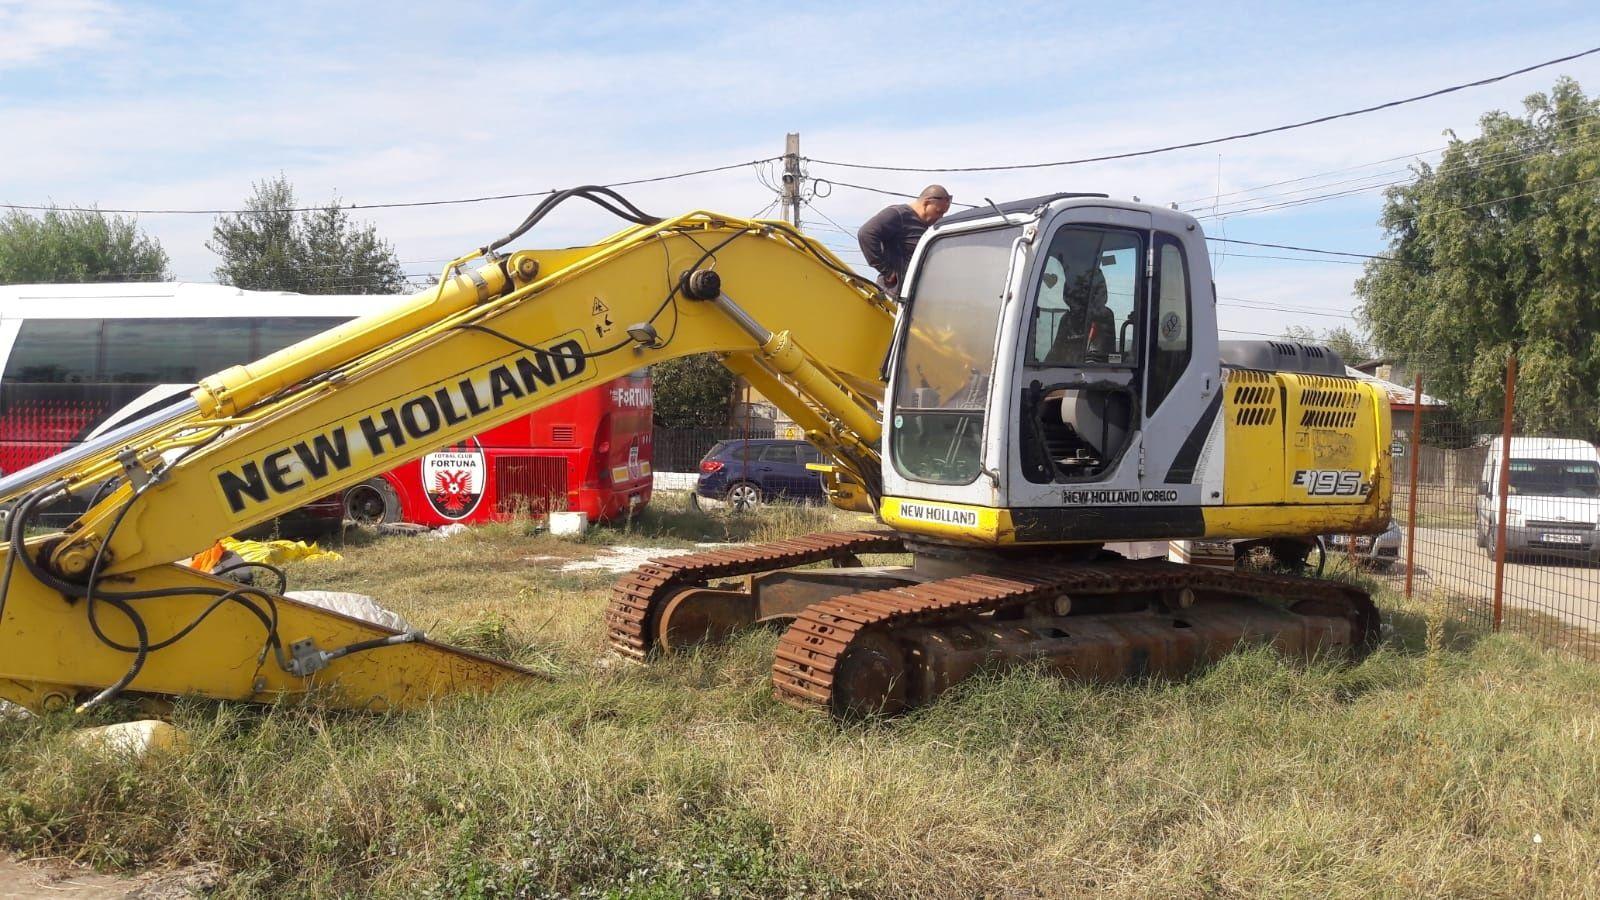 Dezmembrez Excavator New Holland Kobelco E195B/Fiat Kobelco, an 2007